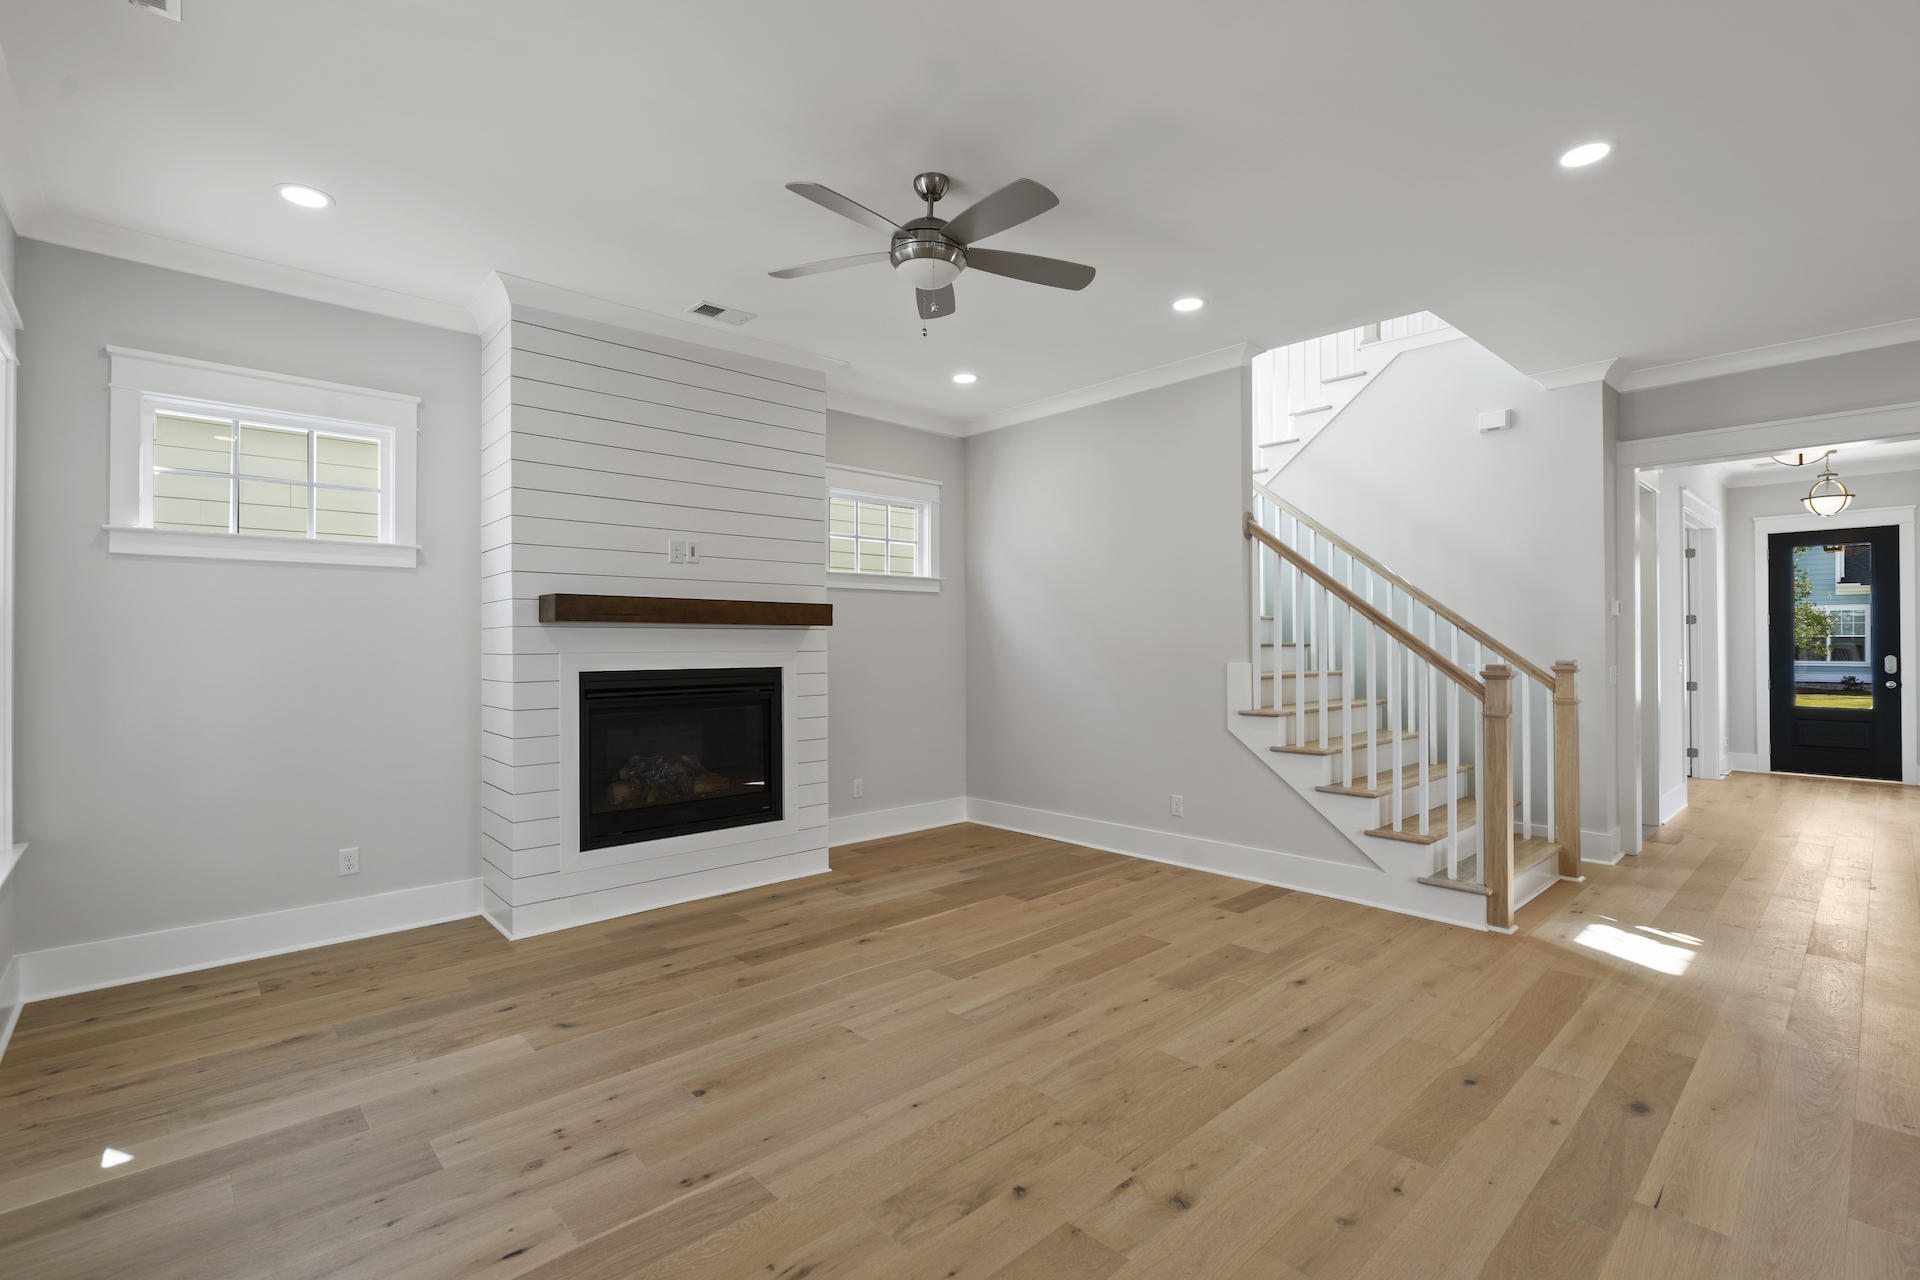 Midtown Homes For Sale - 1328 Upper Union, Mount Pleasant, SC - 21